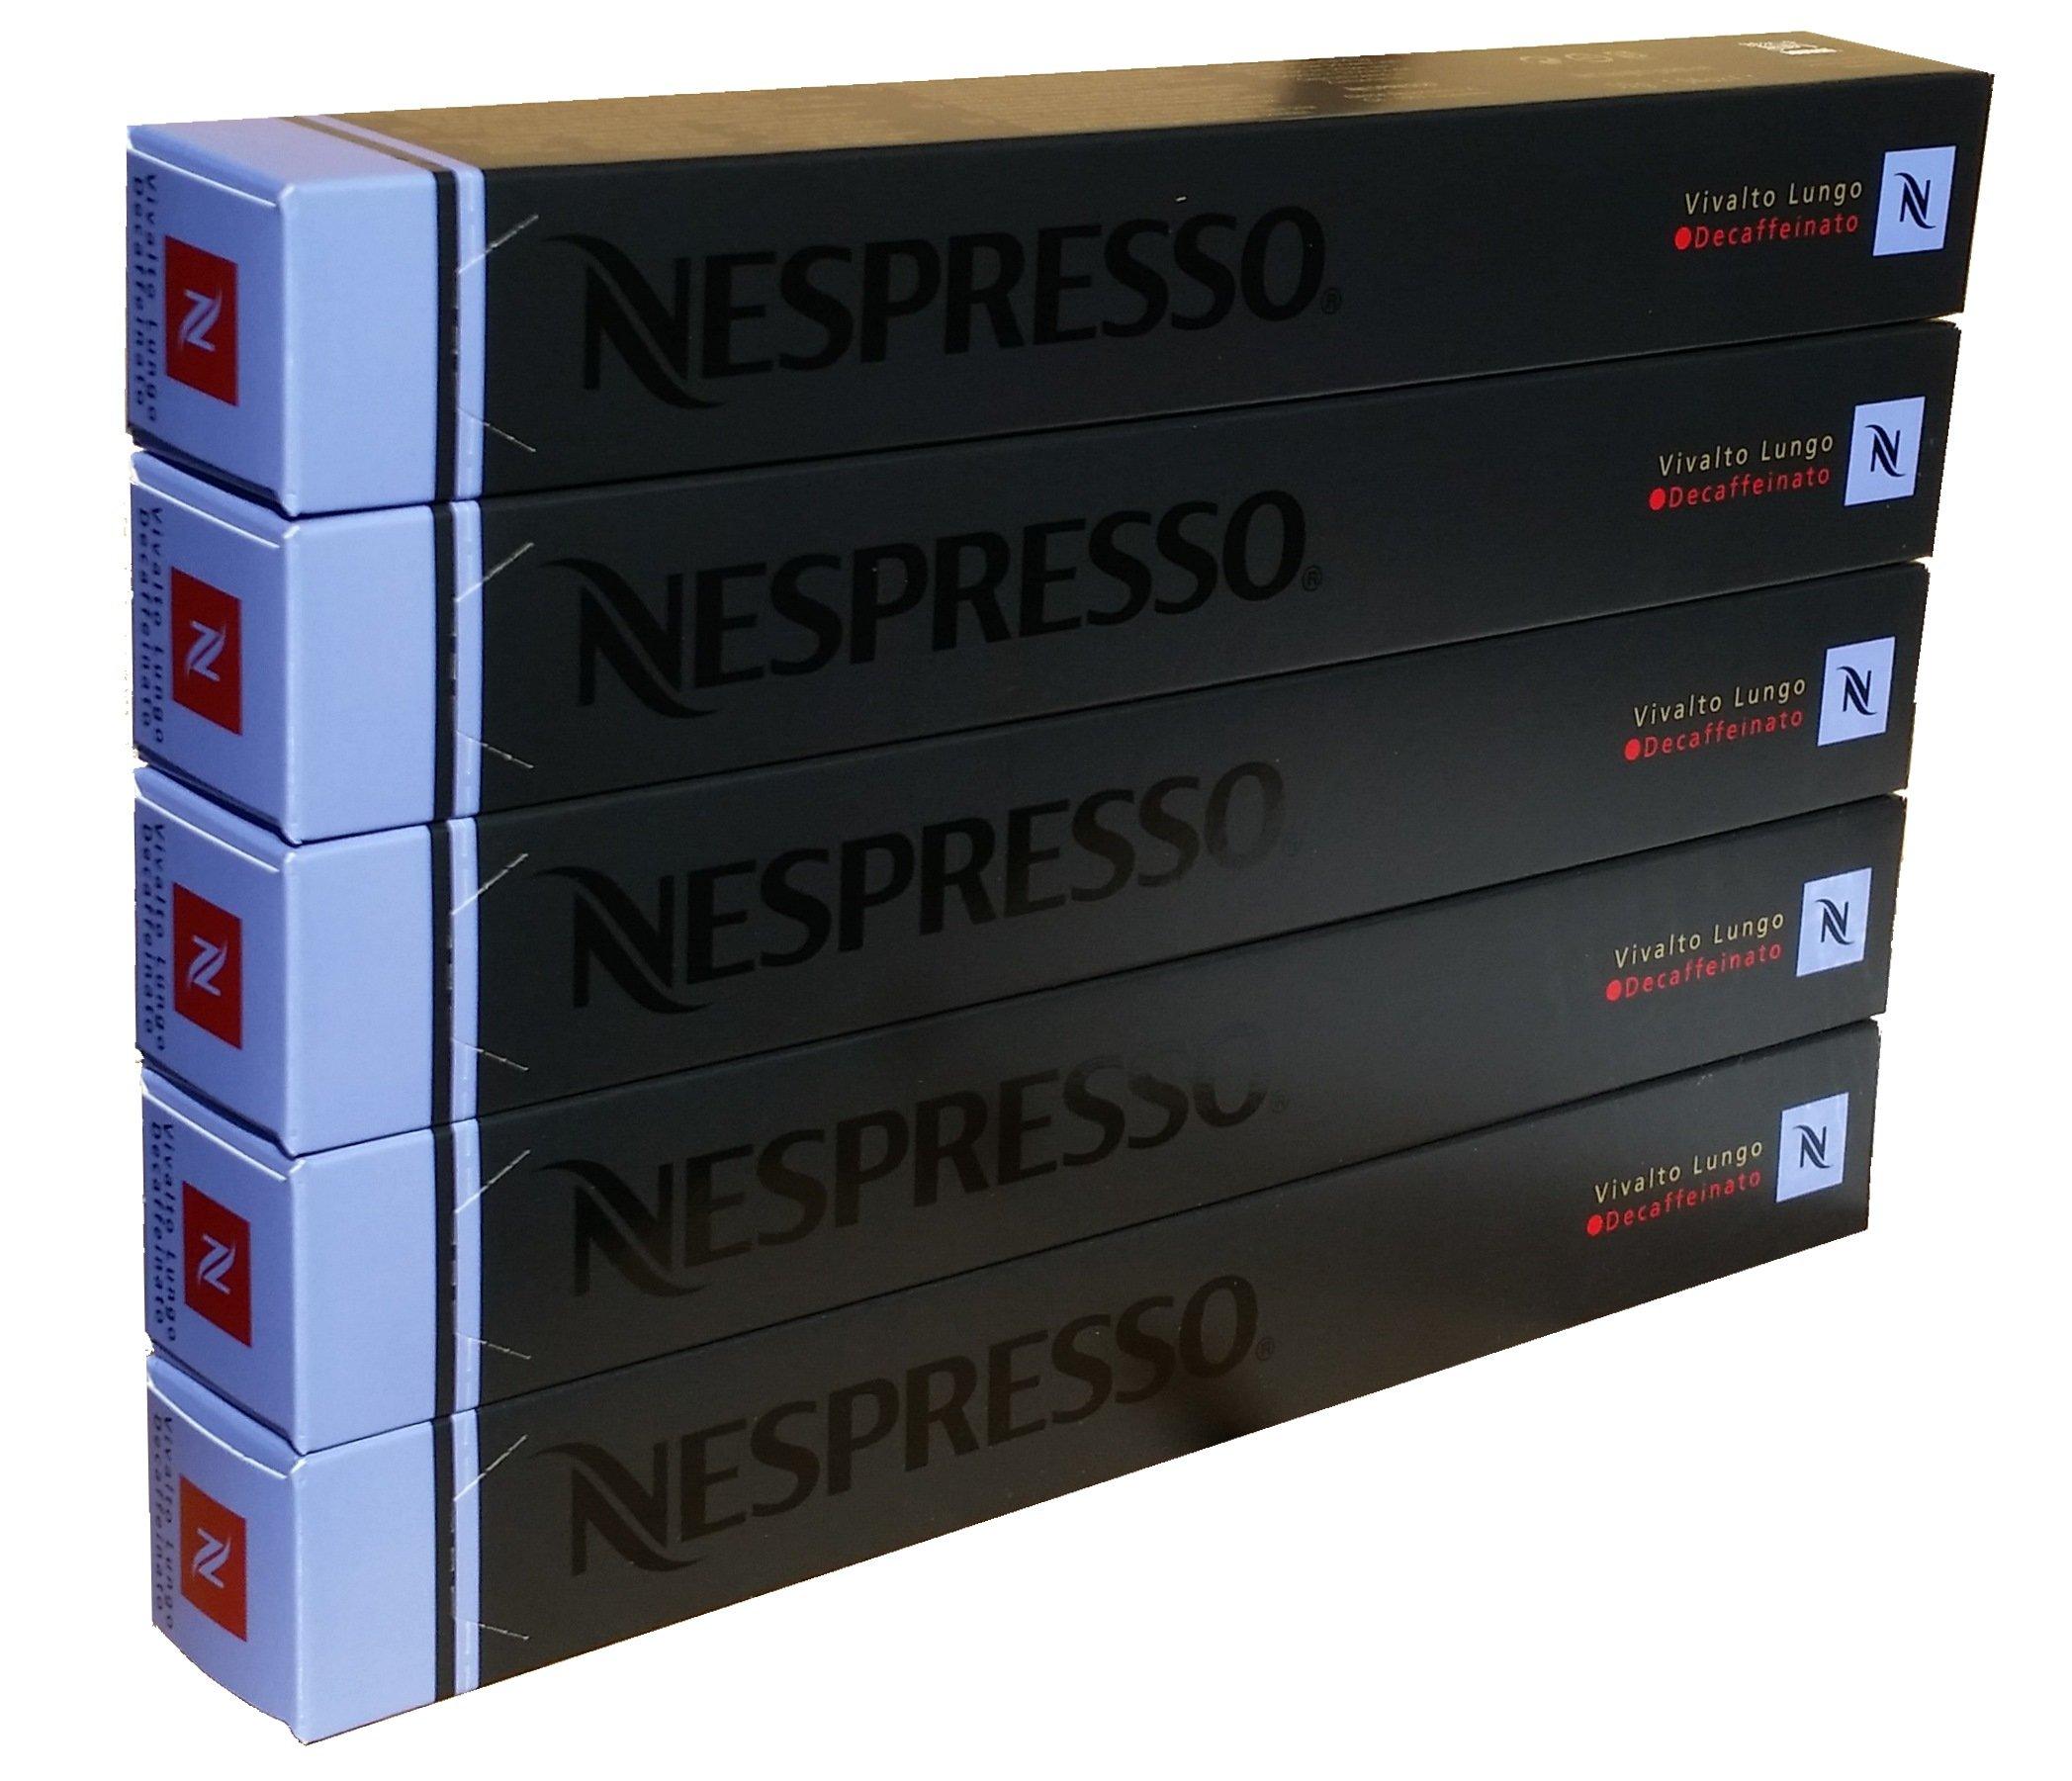 Nespresso OriginalLine - Vivalto Lungo Decaffeinato, 50 Capsules, 5 Sleeves - New Decaf variety - ''NOT compatible with Vertuoline''